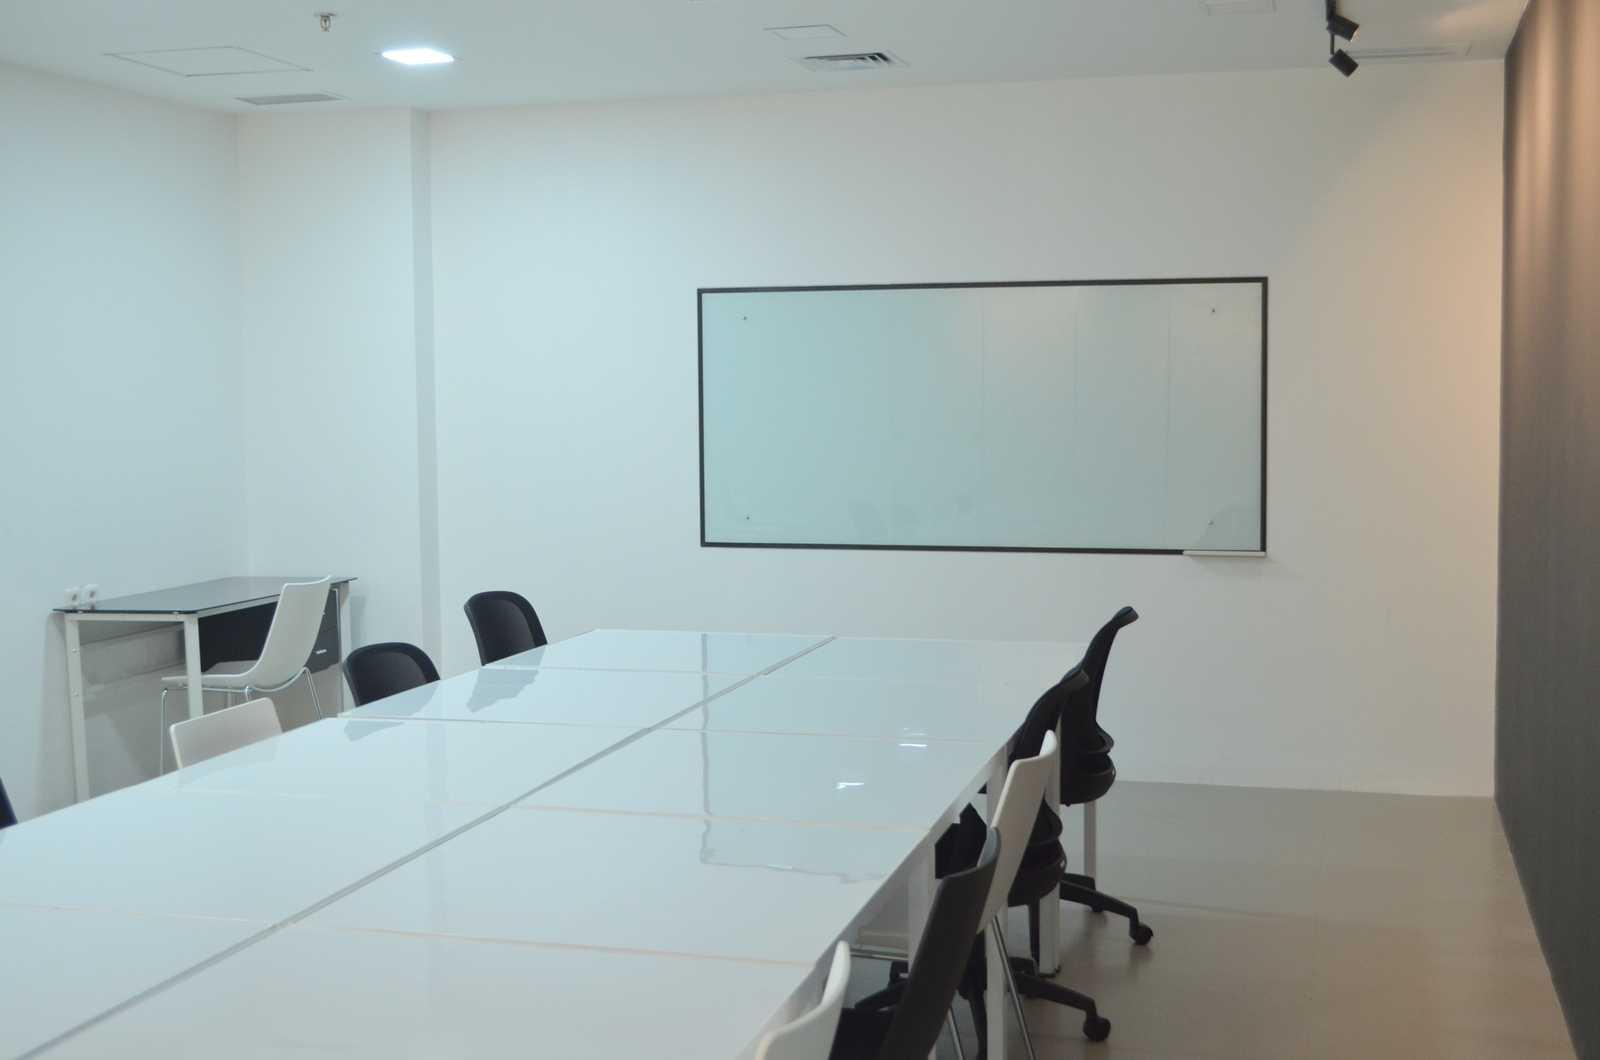 X3M Architects Esmod Creative Hub Kota Tgr. Sel., Kota Tangerang Selatan, Banten, Indonesia Kota Tgr. Sel., Kota Tangerang Selatan, Banten, Indonesia X3M-Architects-Esmod-Creative-Hub Modern  56028